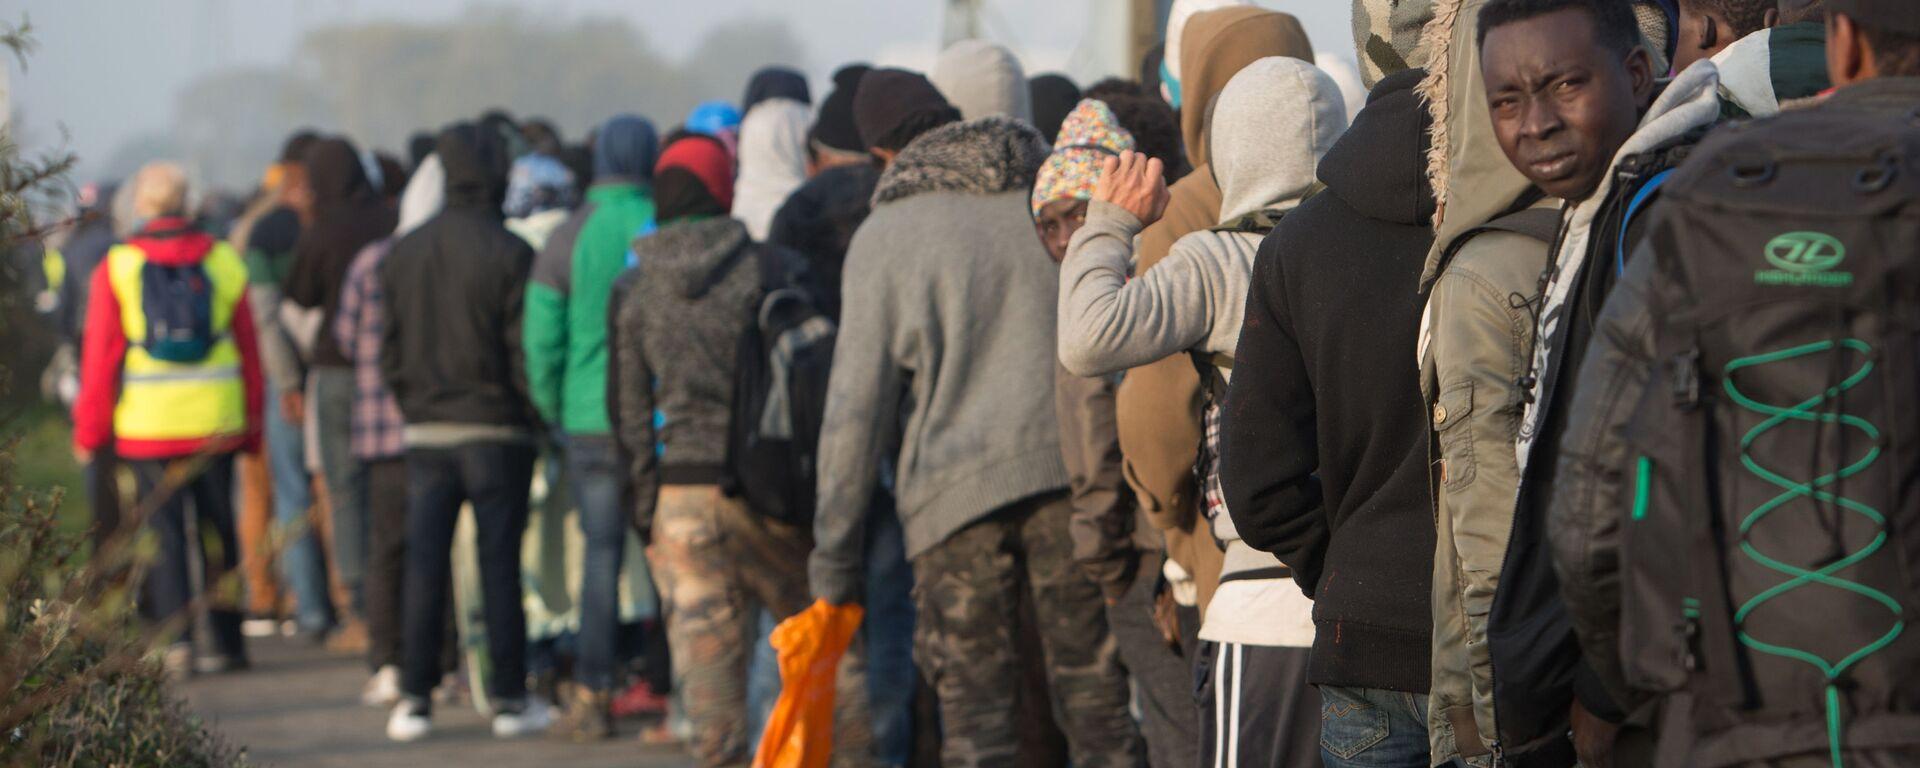 Uchodźcy w Calais, Francja - Sputnik Polska, 1920, 22.02.2021